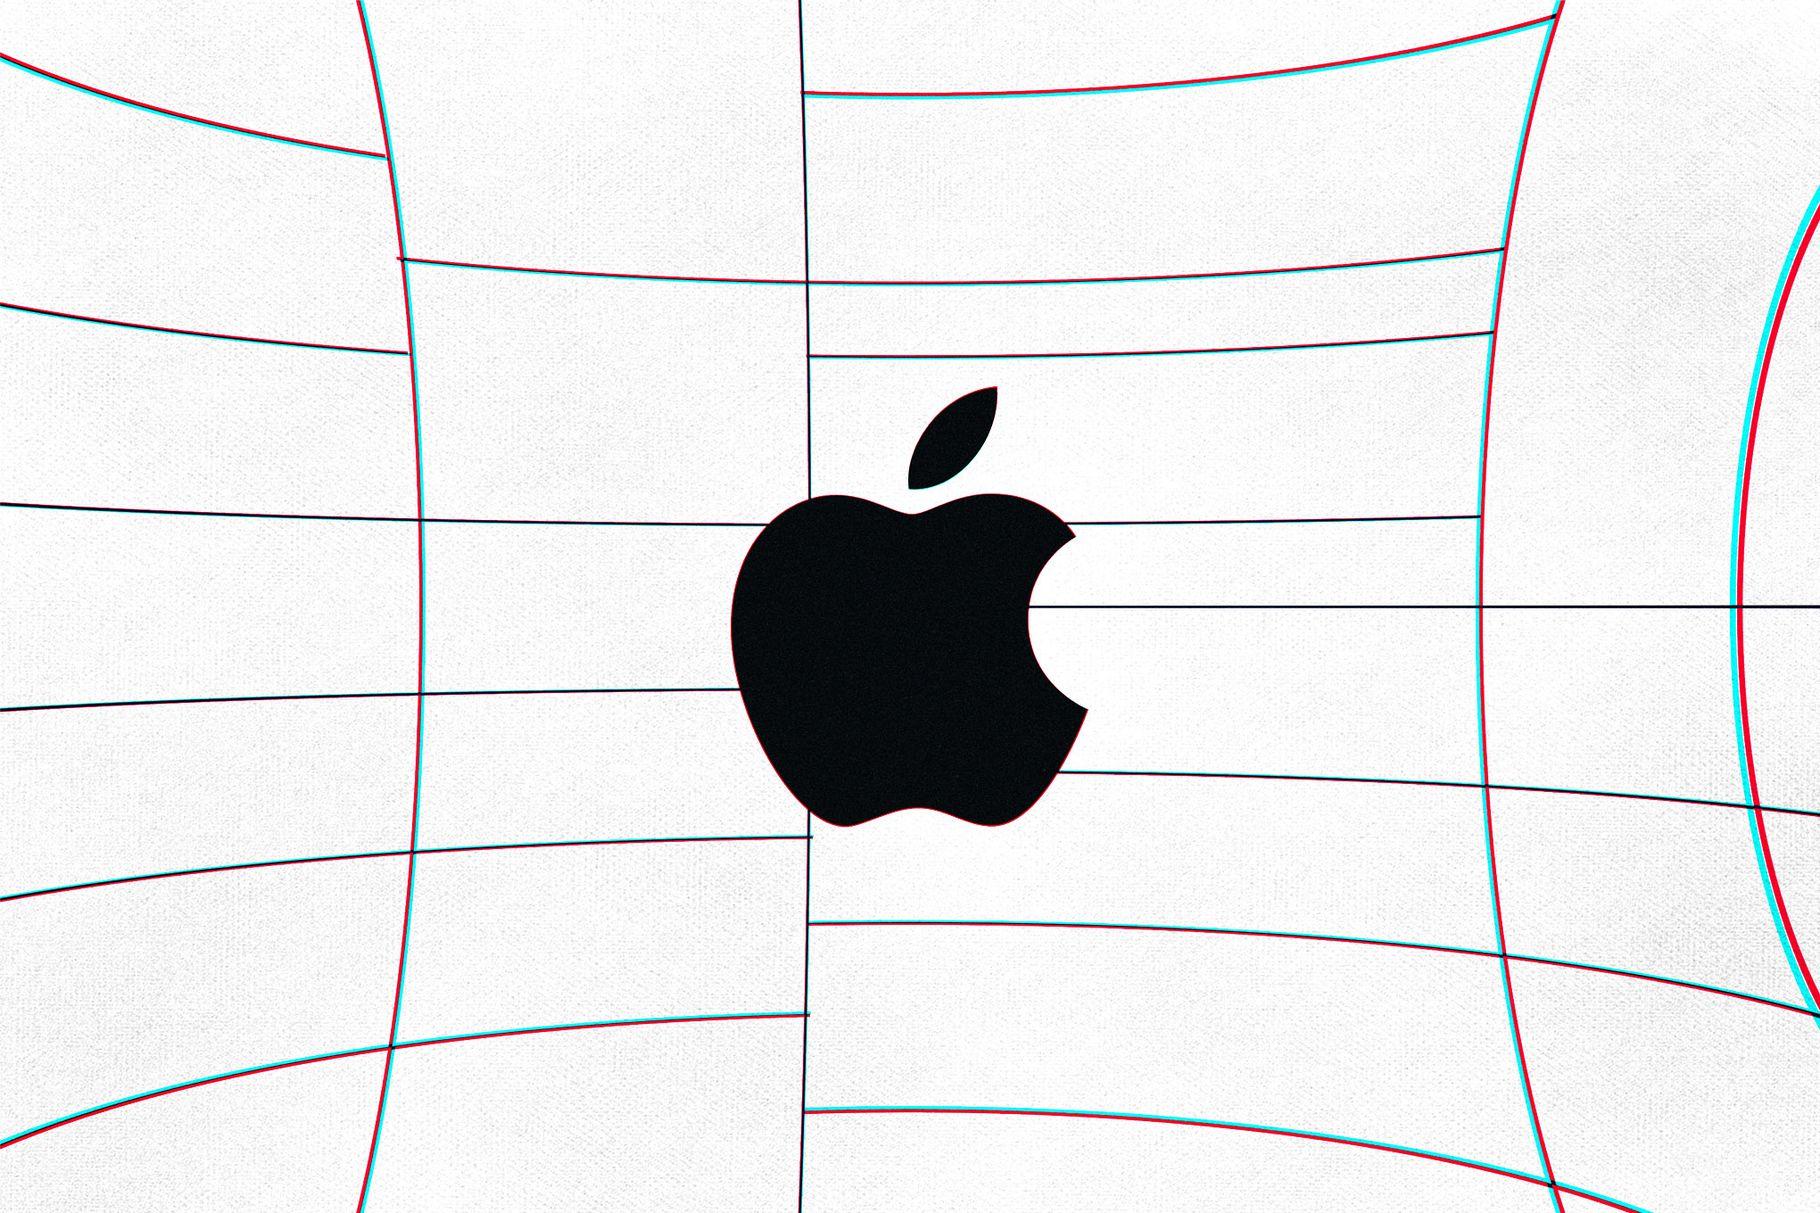 iOS-дайджест №5 (27 апреля – 16 мая)